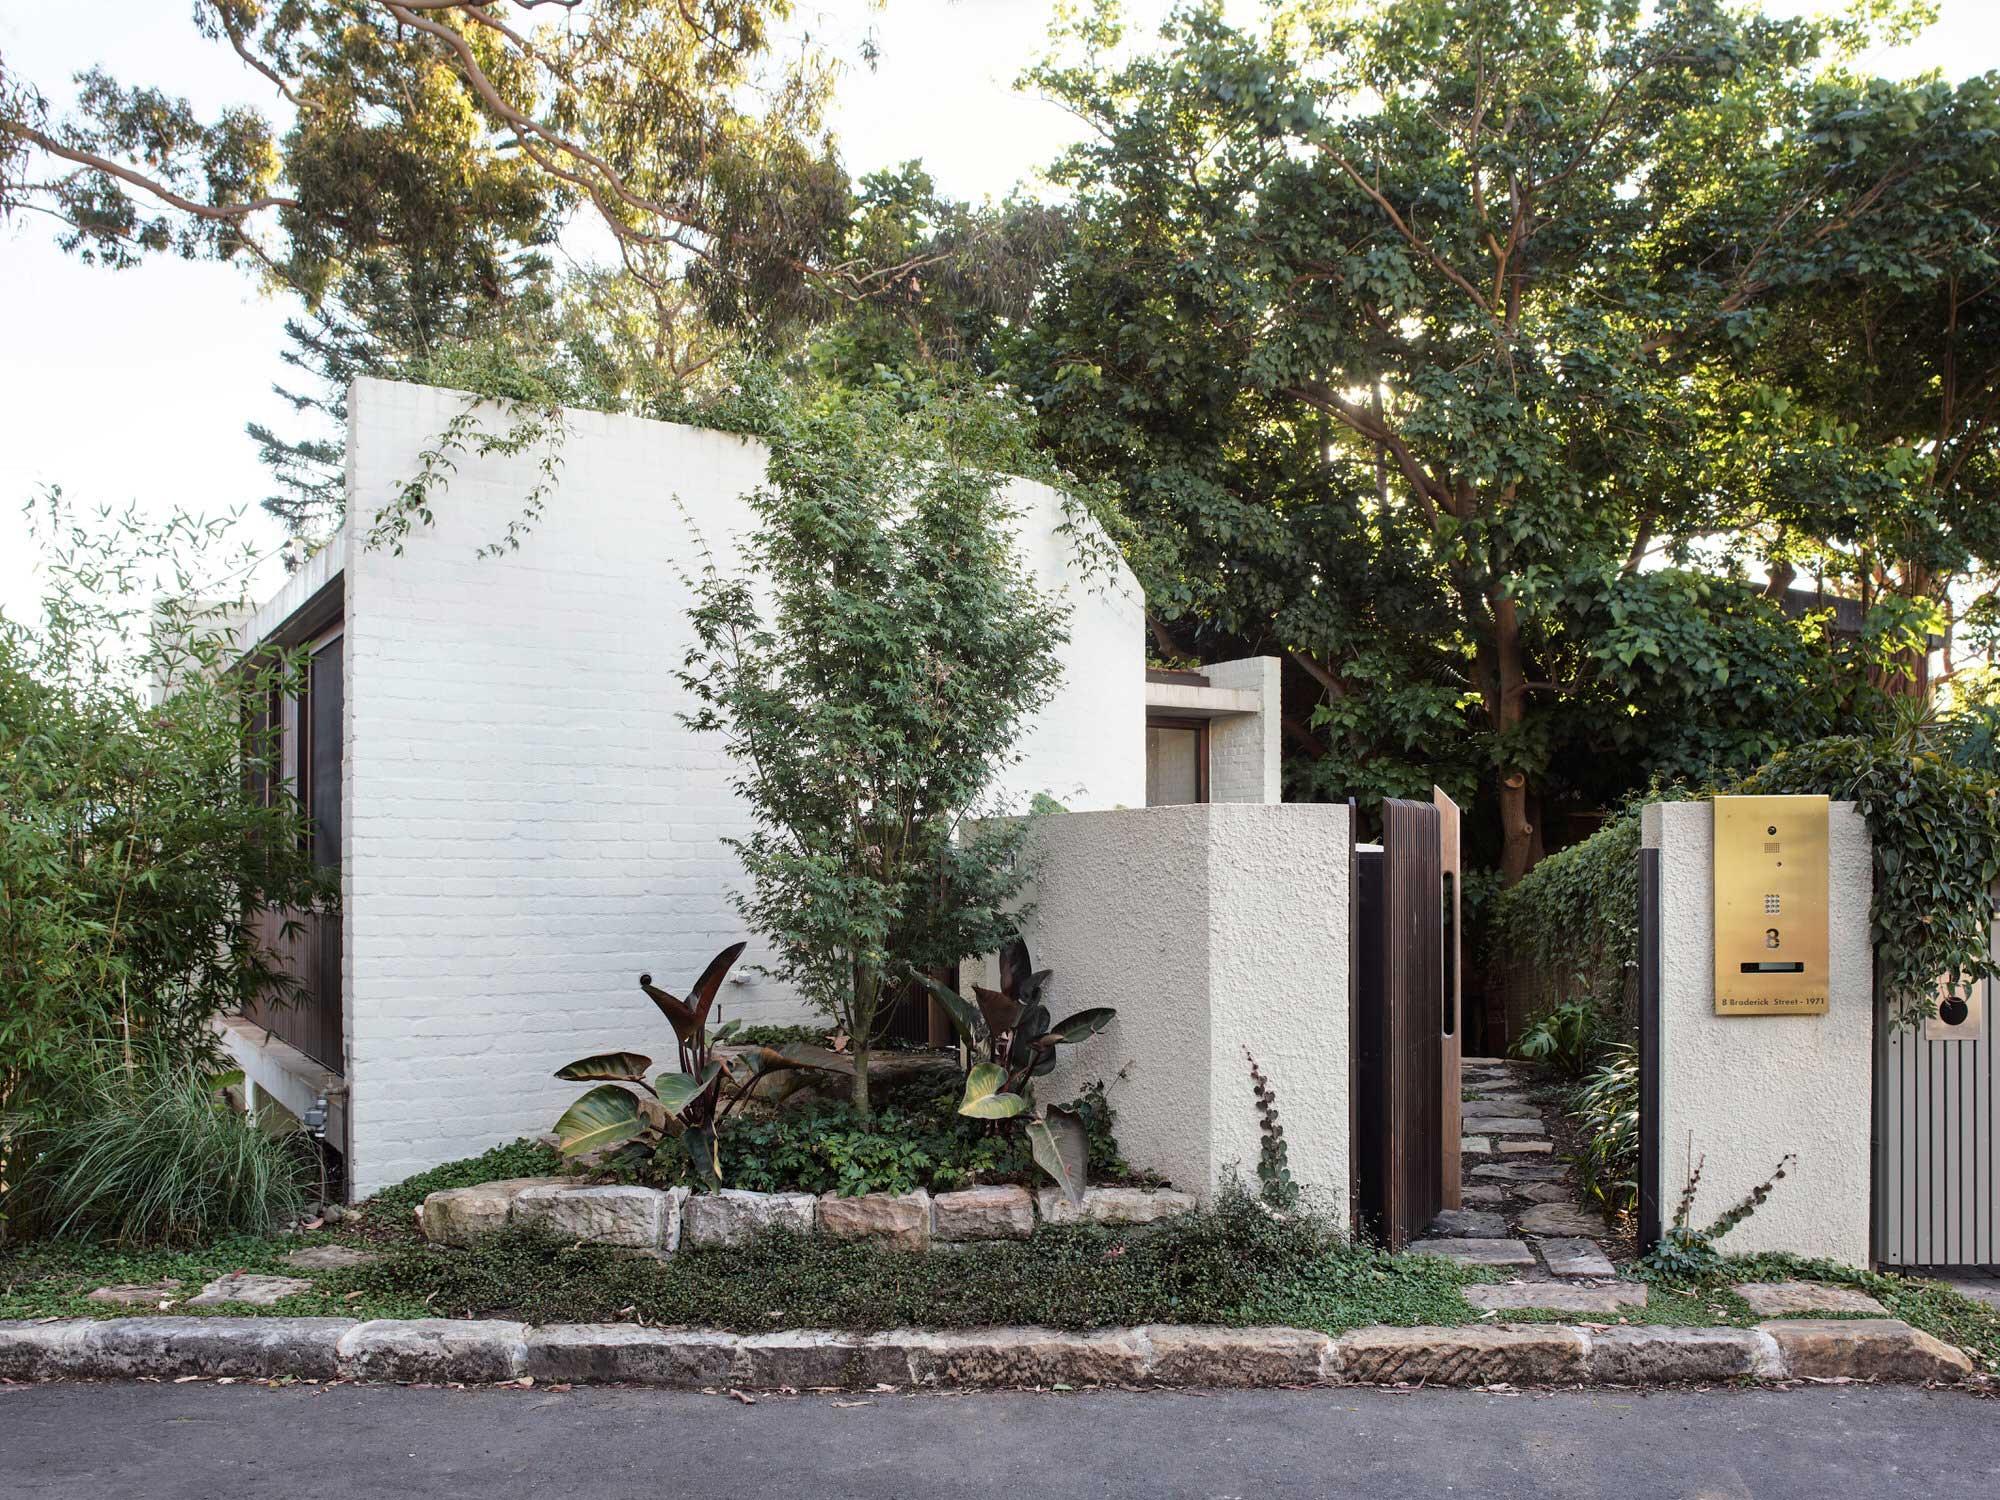 Fox Johnston Sir Grounds House Balmain Sydney Architecture Conrad Johnston Photo Anson Smart Yellowtrace 35